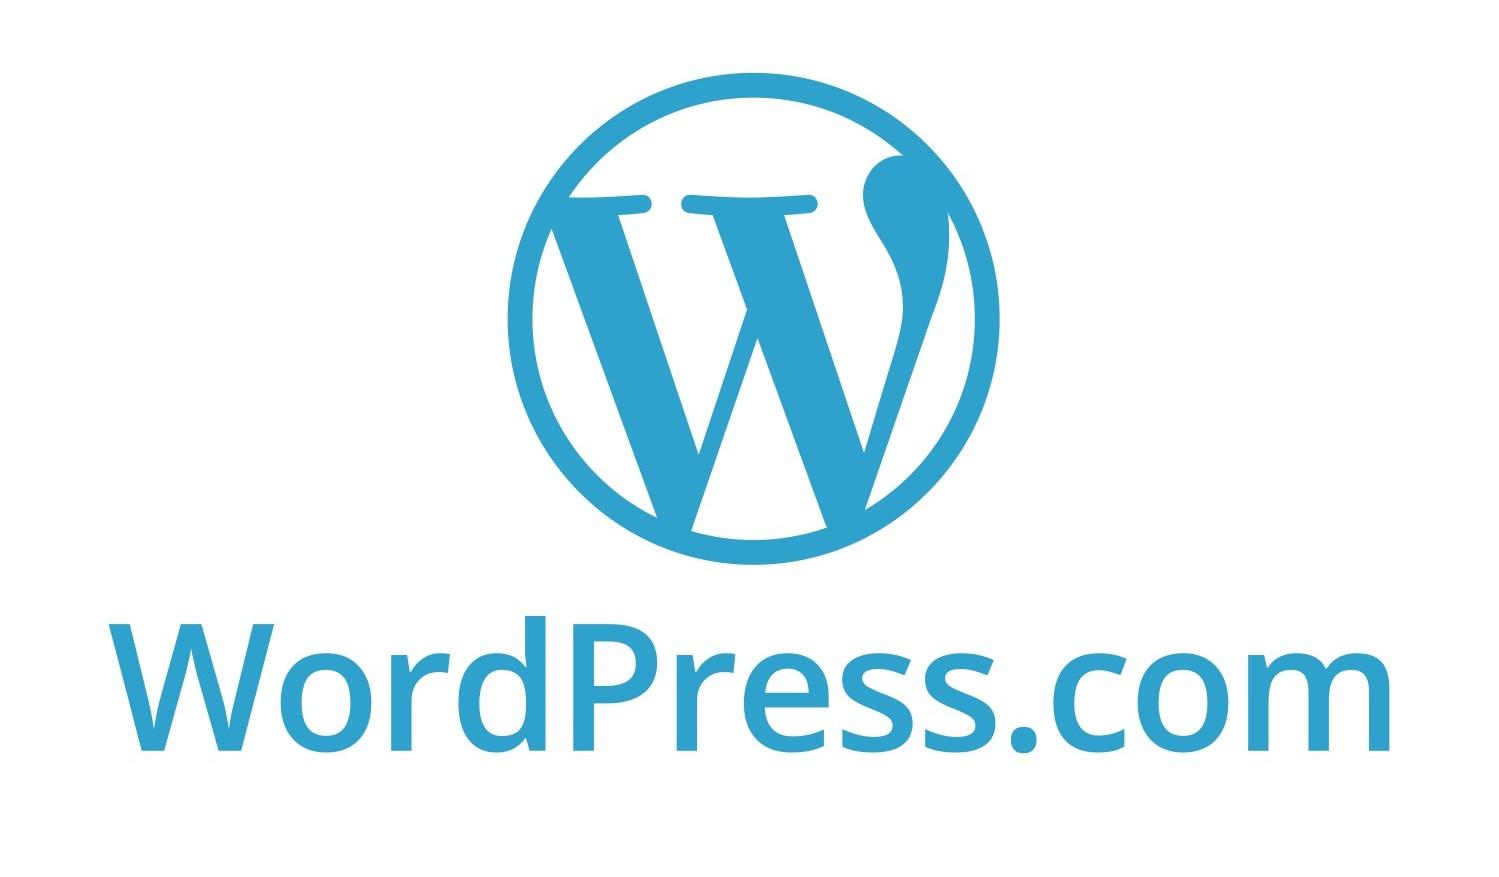 What Is WordPress.com